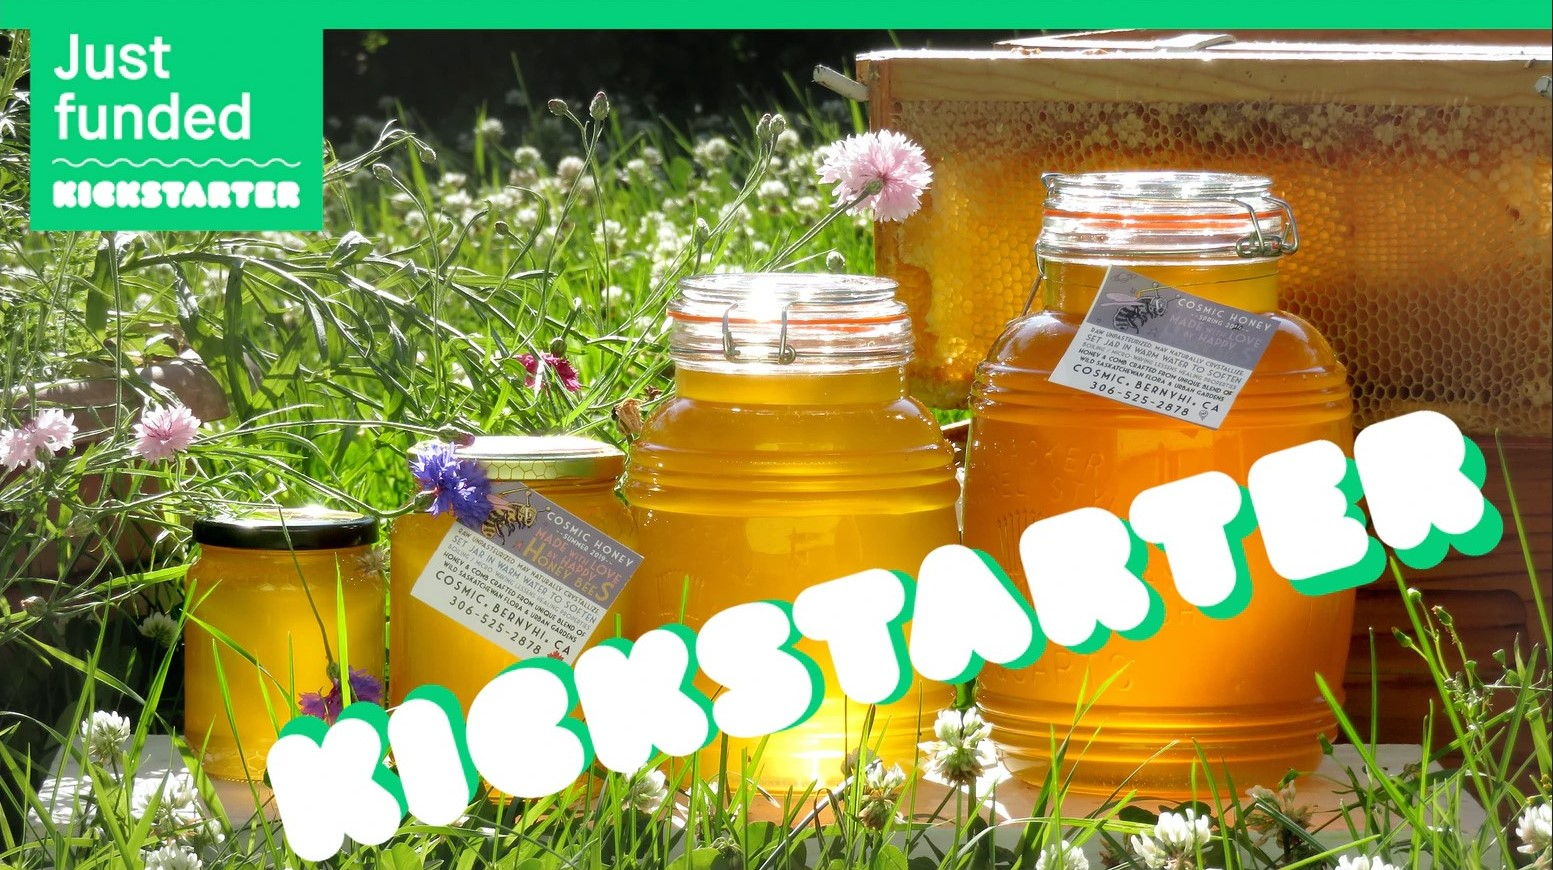 jars of honey with kickstarter logo on top